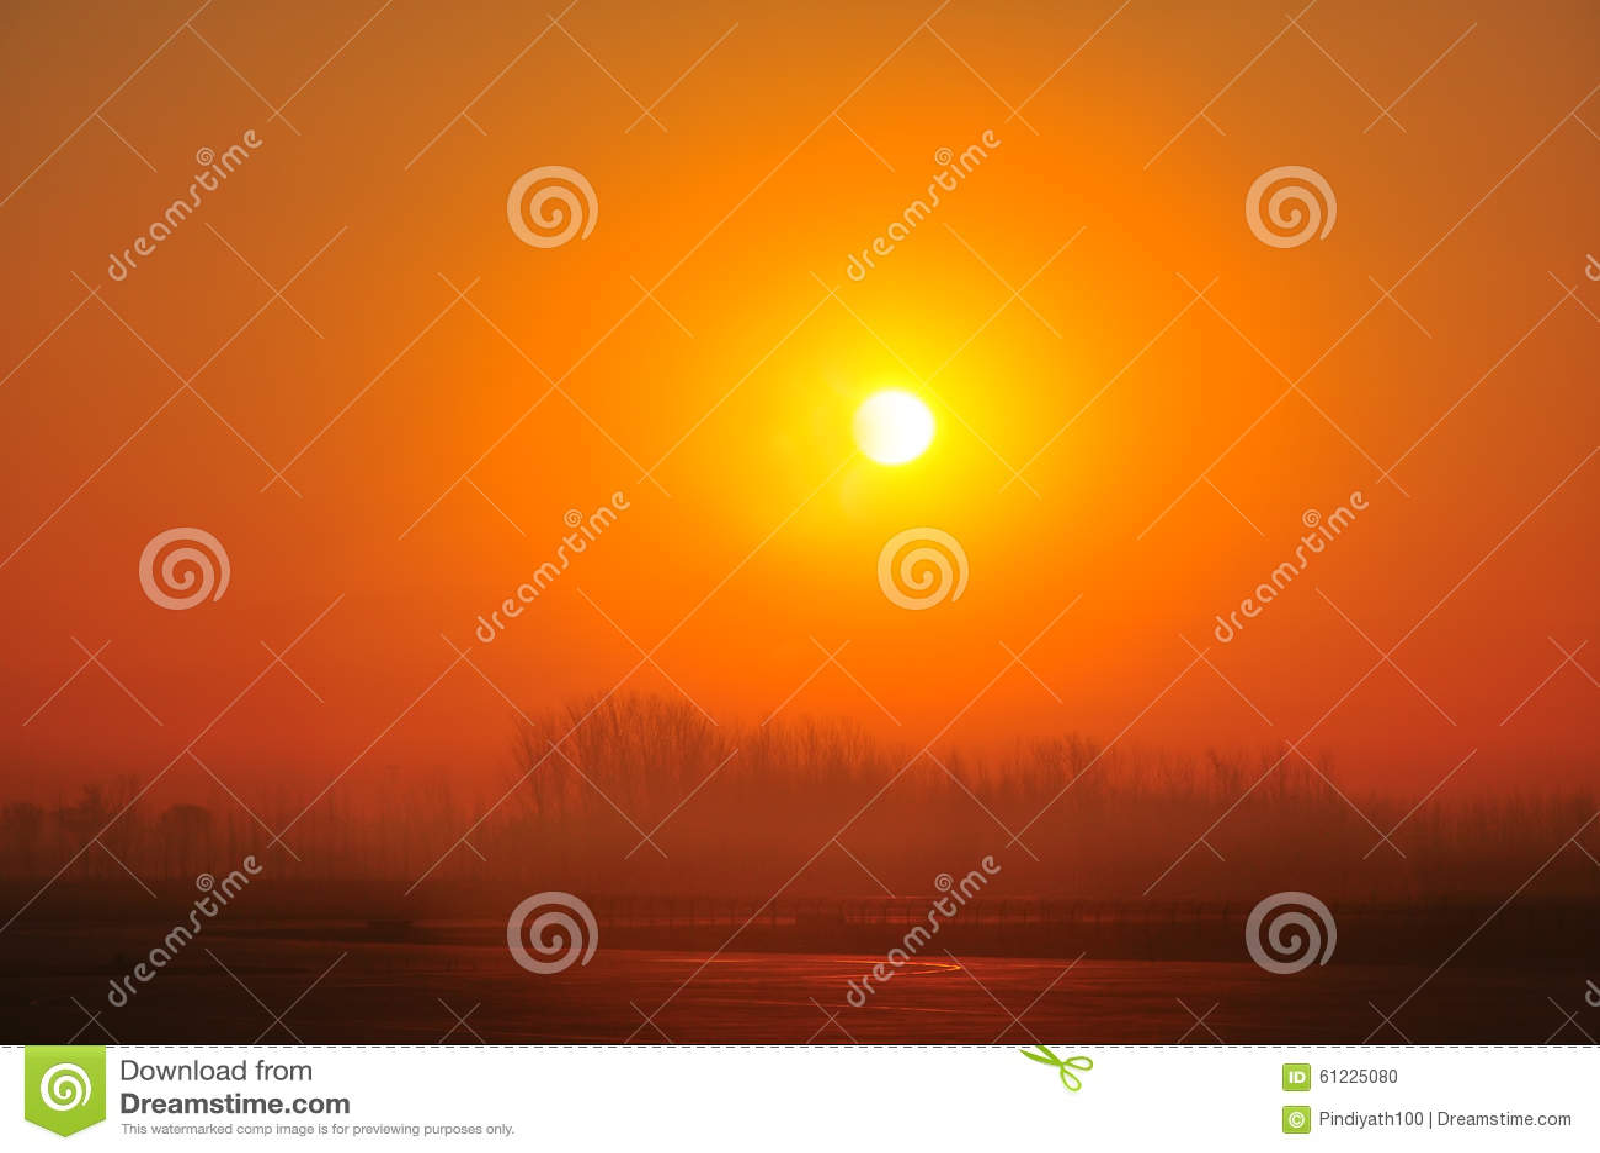 Gouden uur rustige zonsopgang